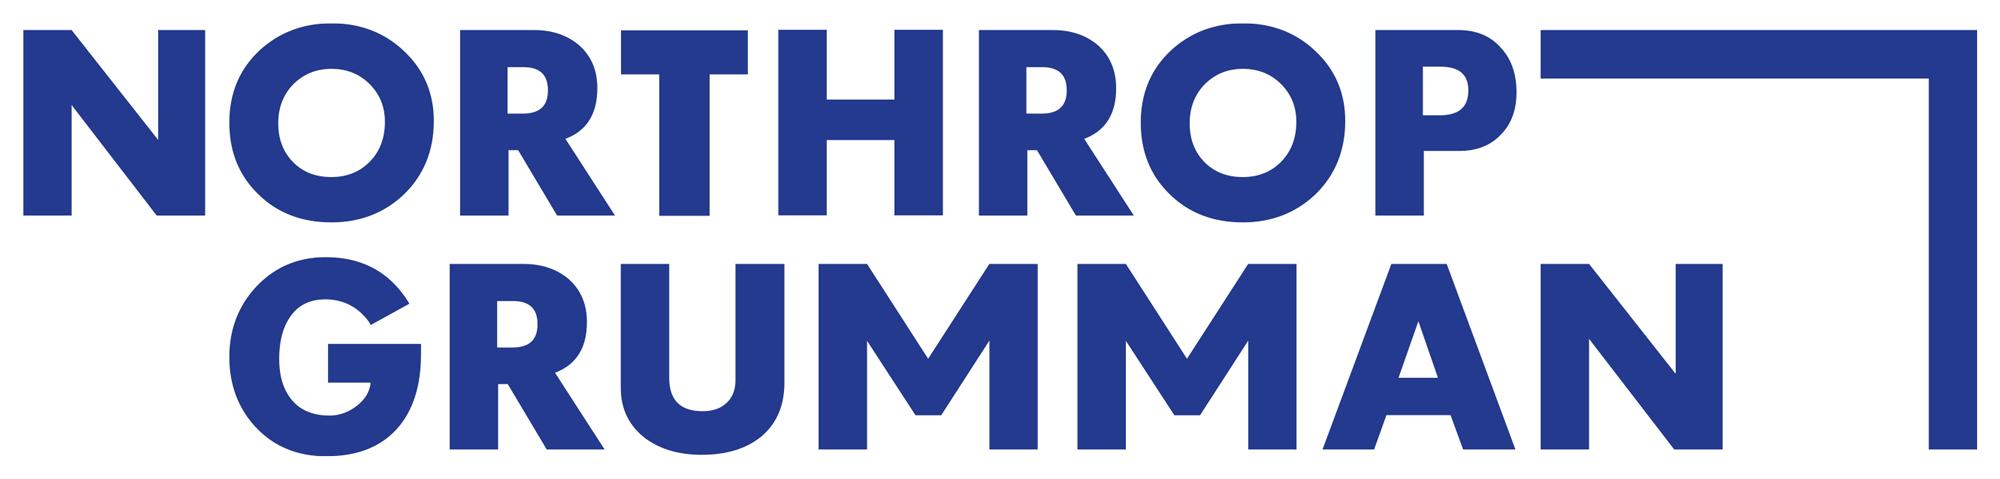 New Logo for Northrop Grumman